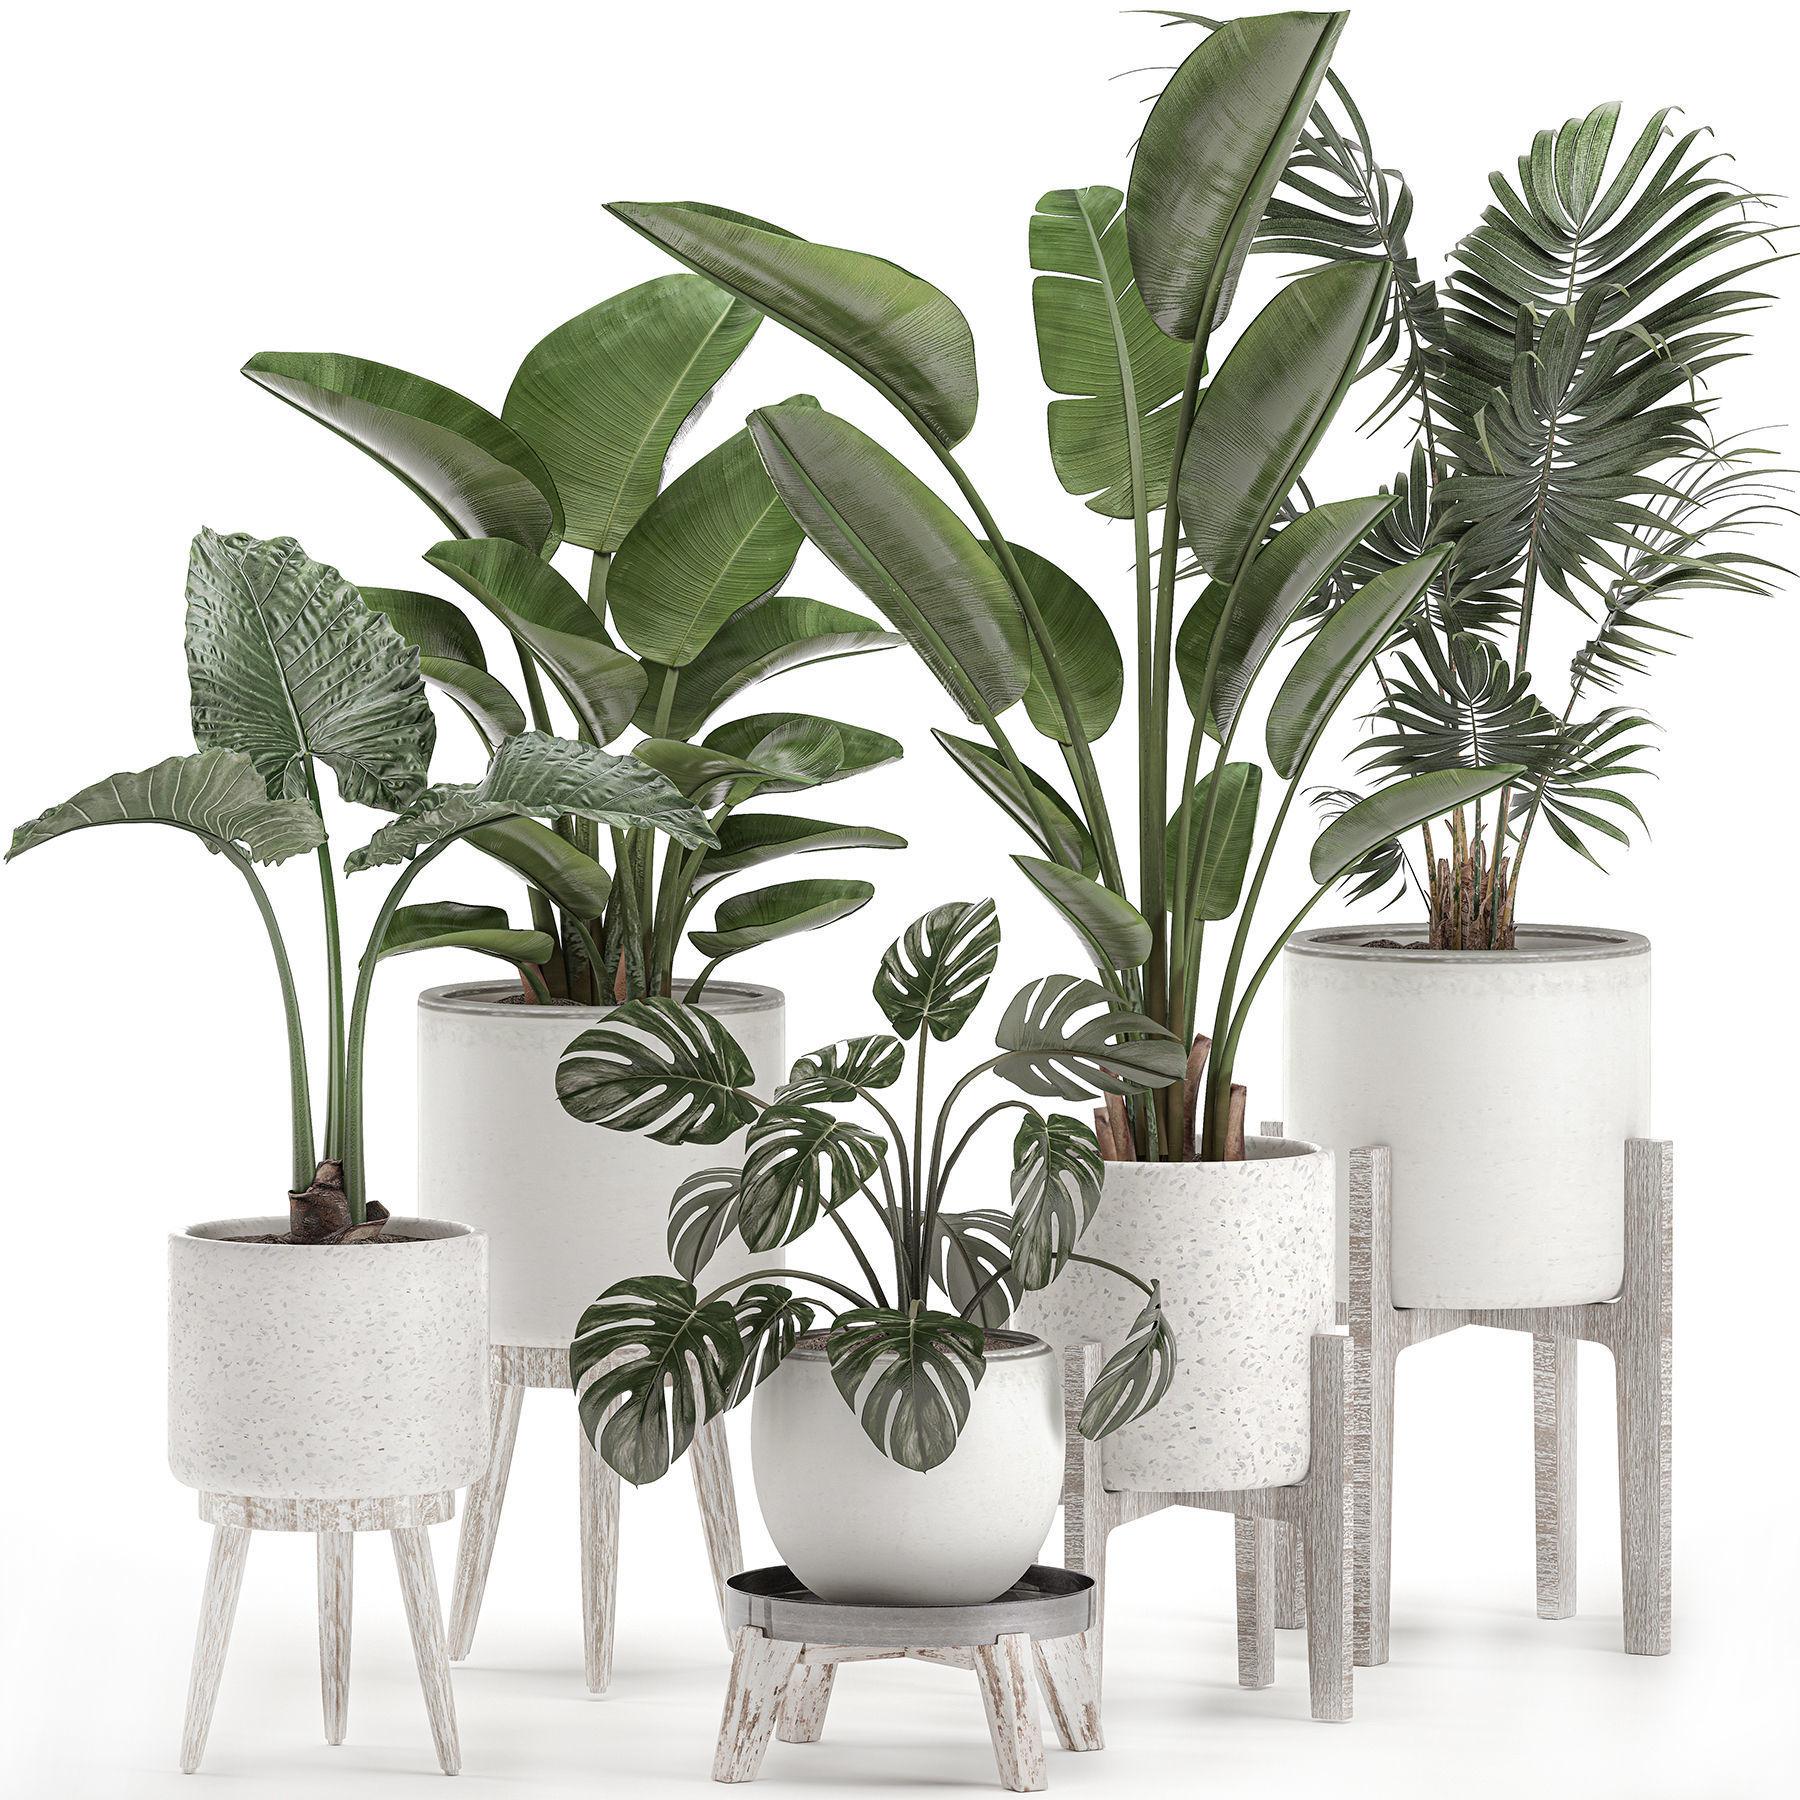 Decorative plants for the interior in white pots 557